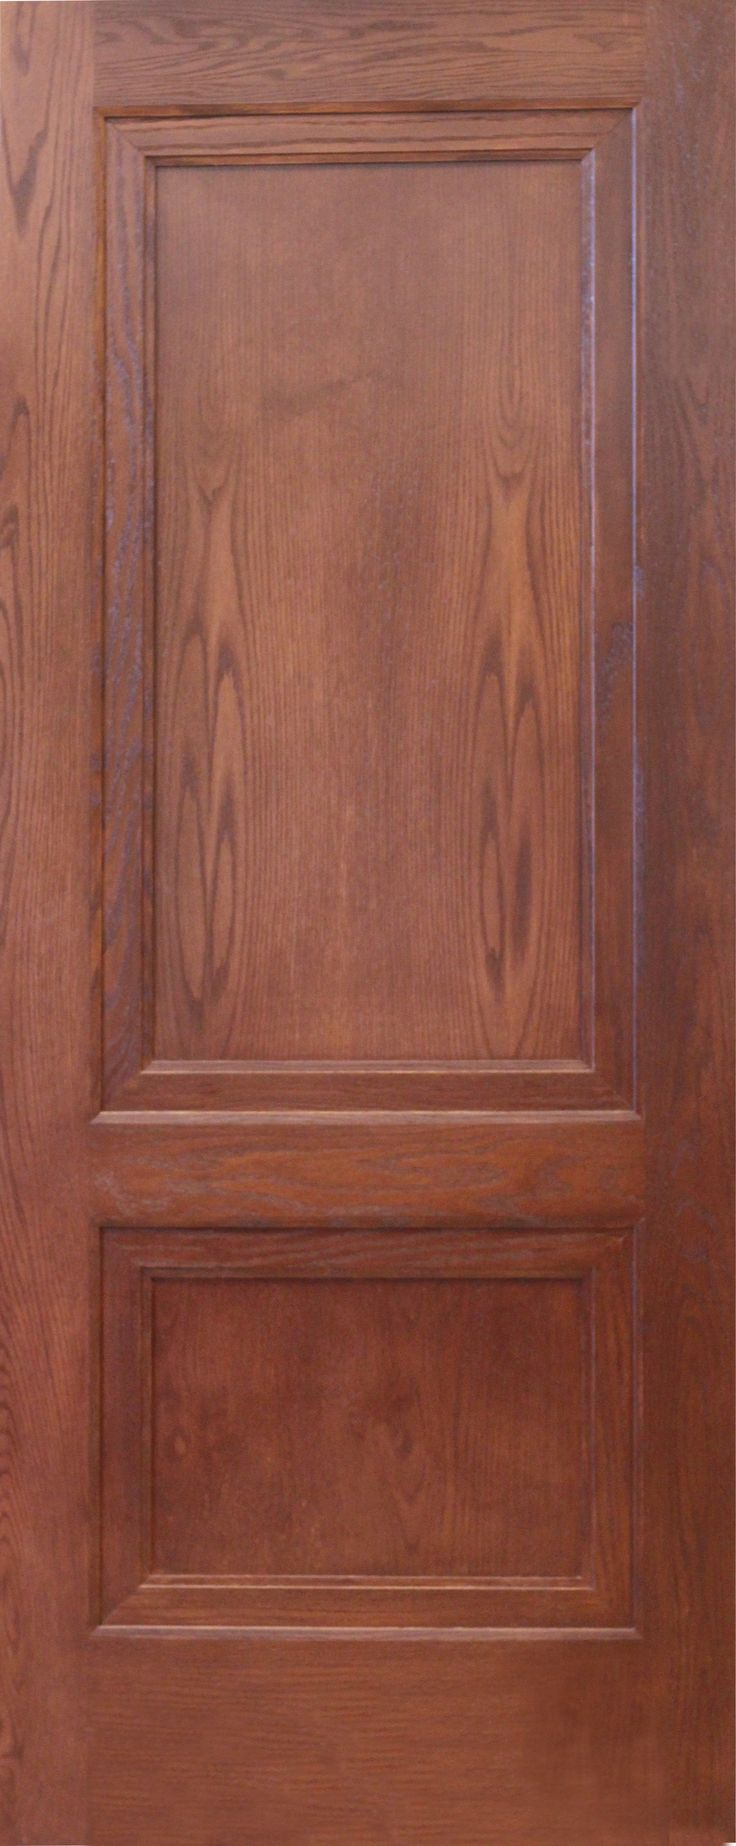 Rustic wood interior doors - Layered 2 Panel Oak Interior Door Adds Depth Customized Statement Doors Fully Customized Interior